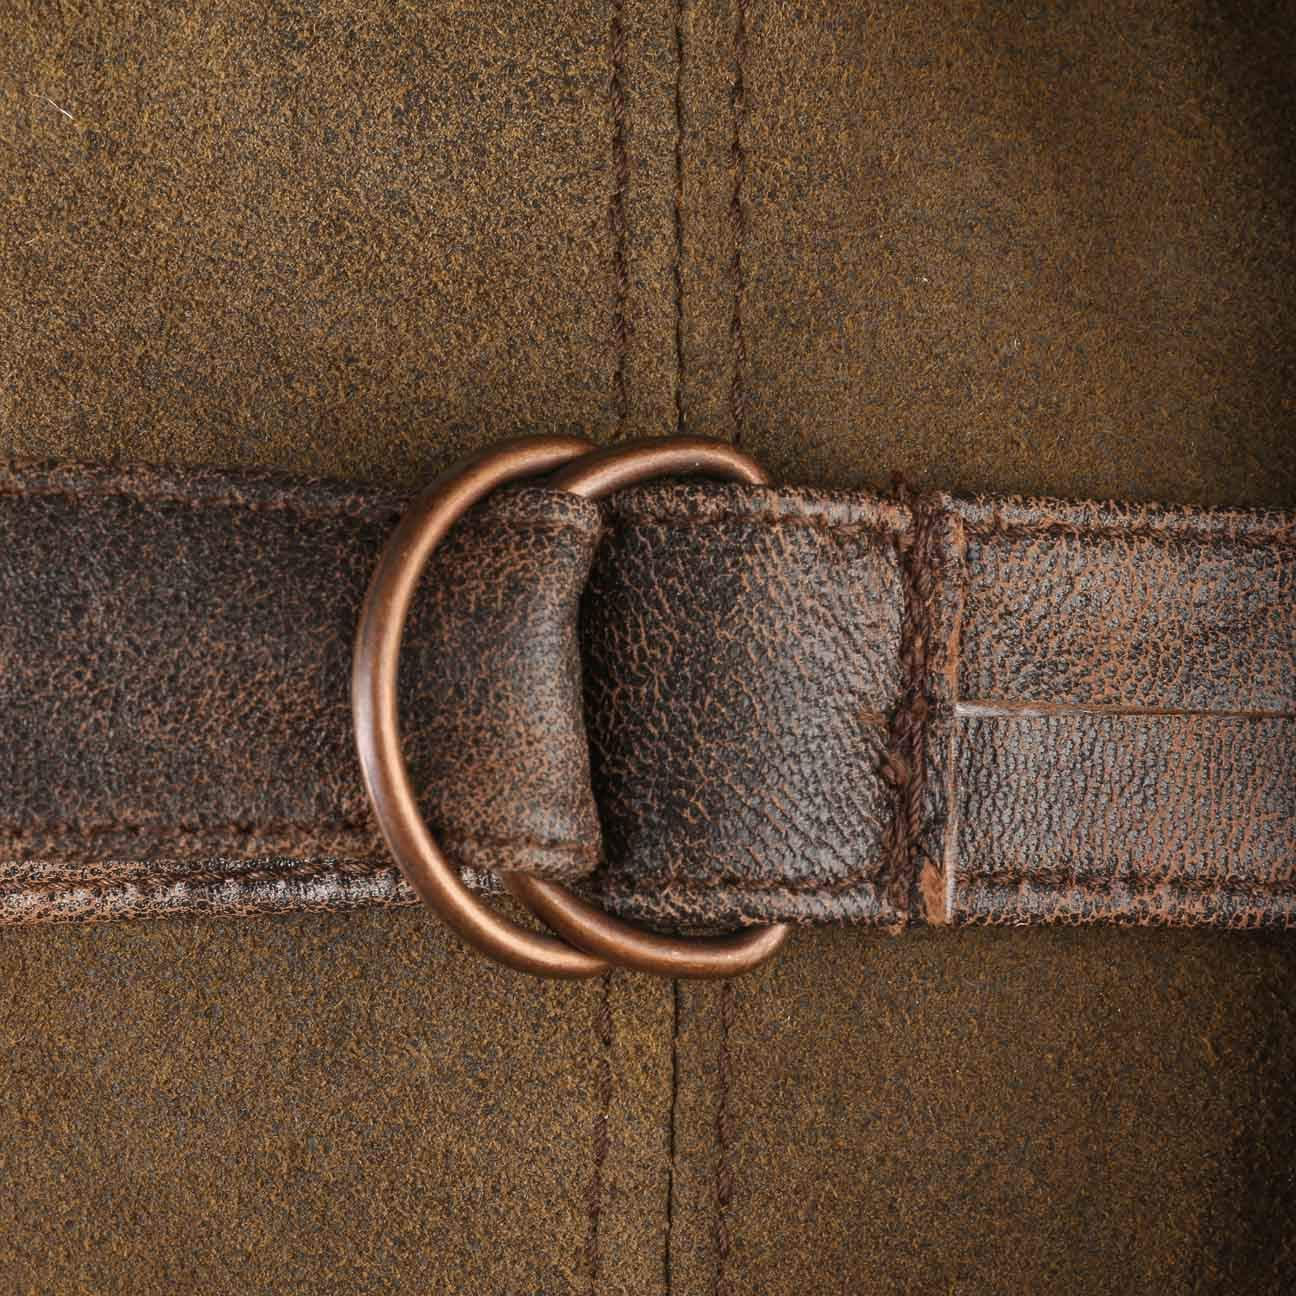 1460f76a931b9 Stetson Lamb Nappa Leather Aviator Hat Trapper chapka (XXL (62-63 cm) -  Brown)  Amazon.co.uk  Clothing